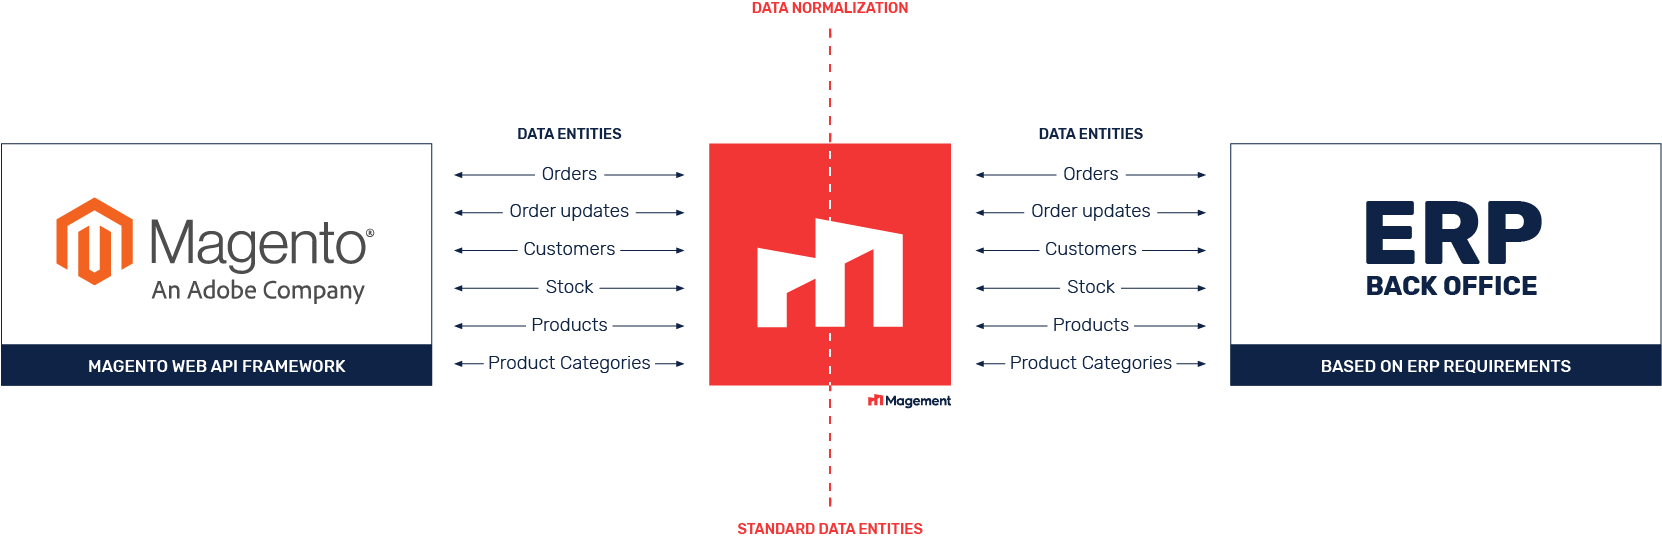 Magement-Magento-ERP-integration-Data-Streams.png